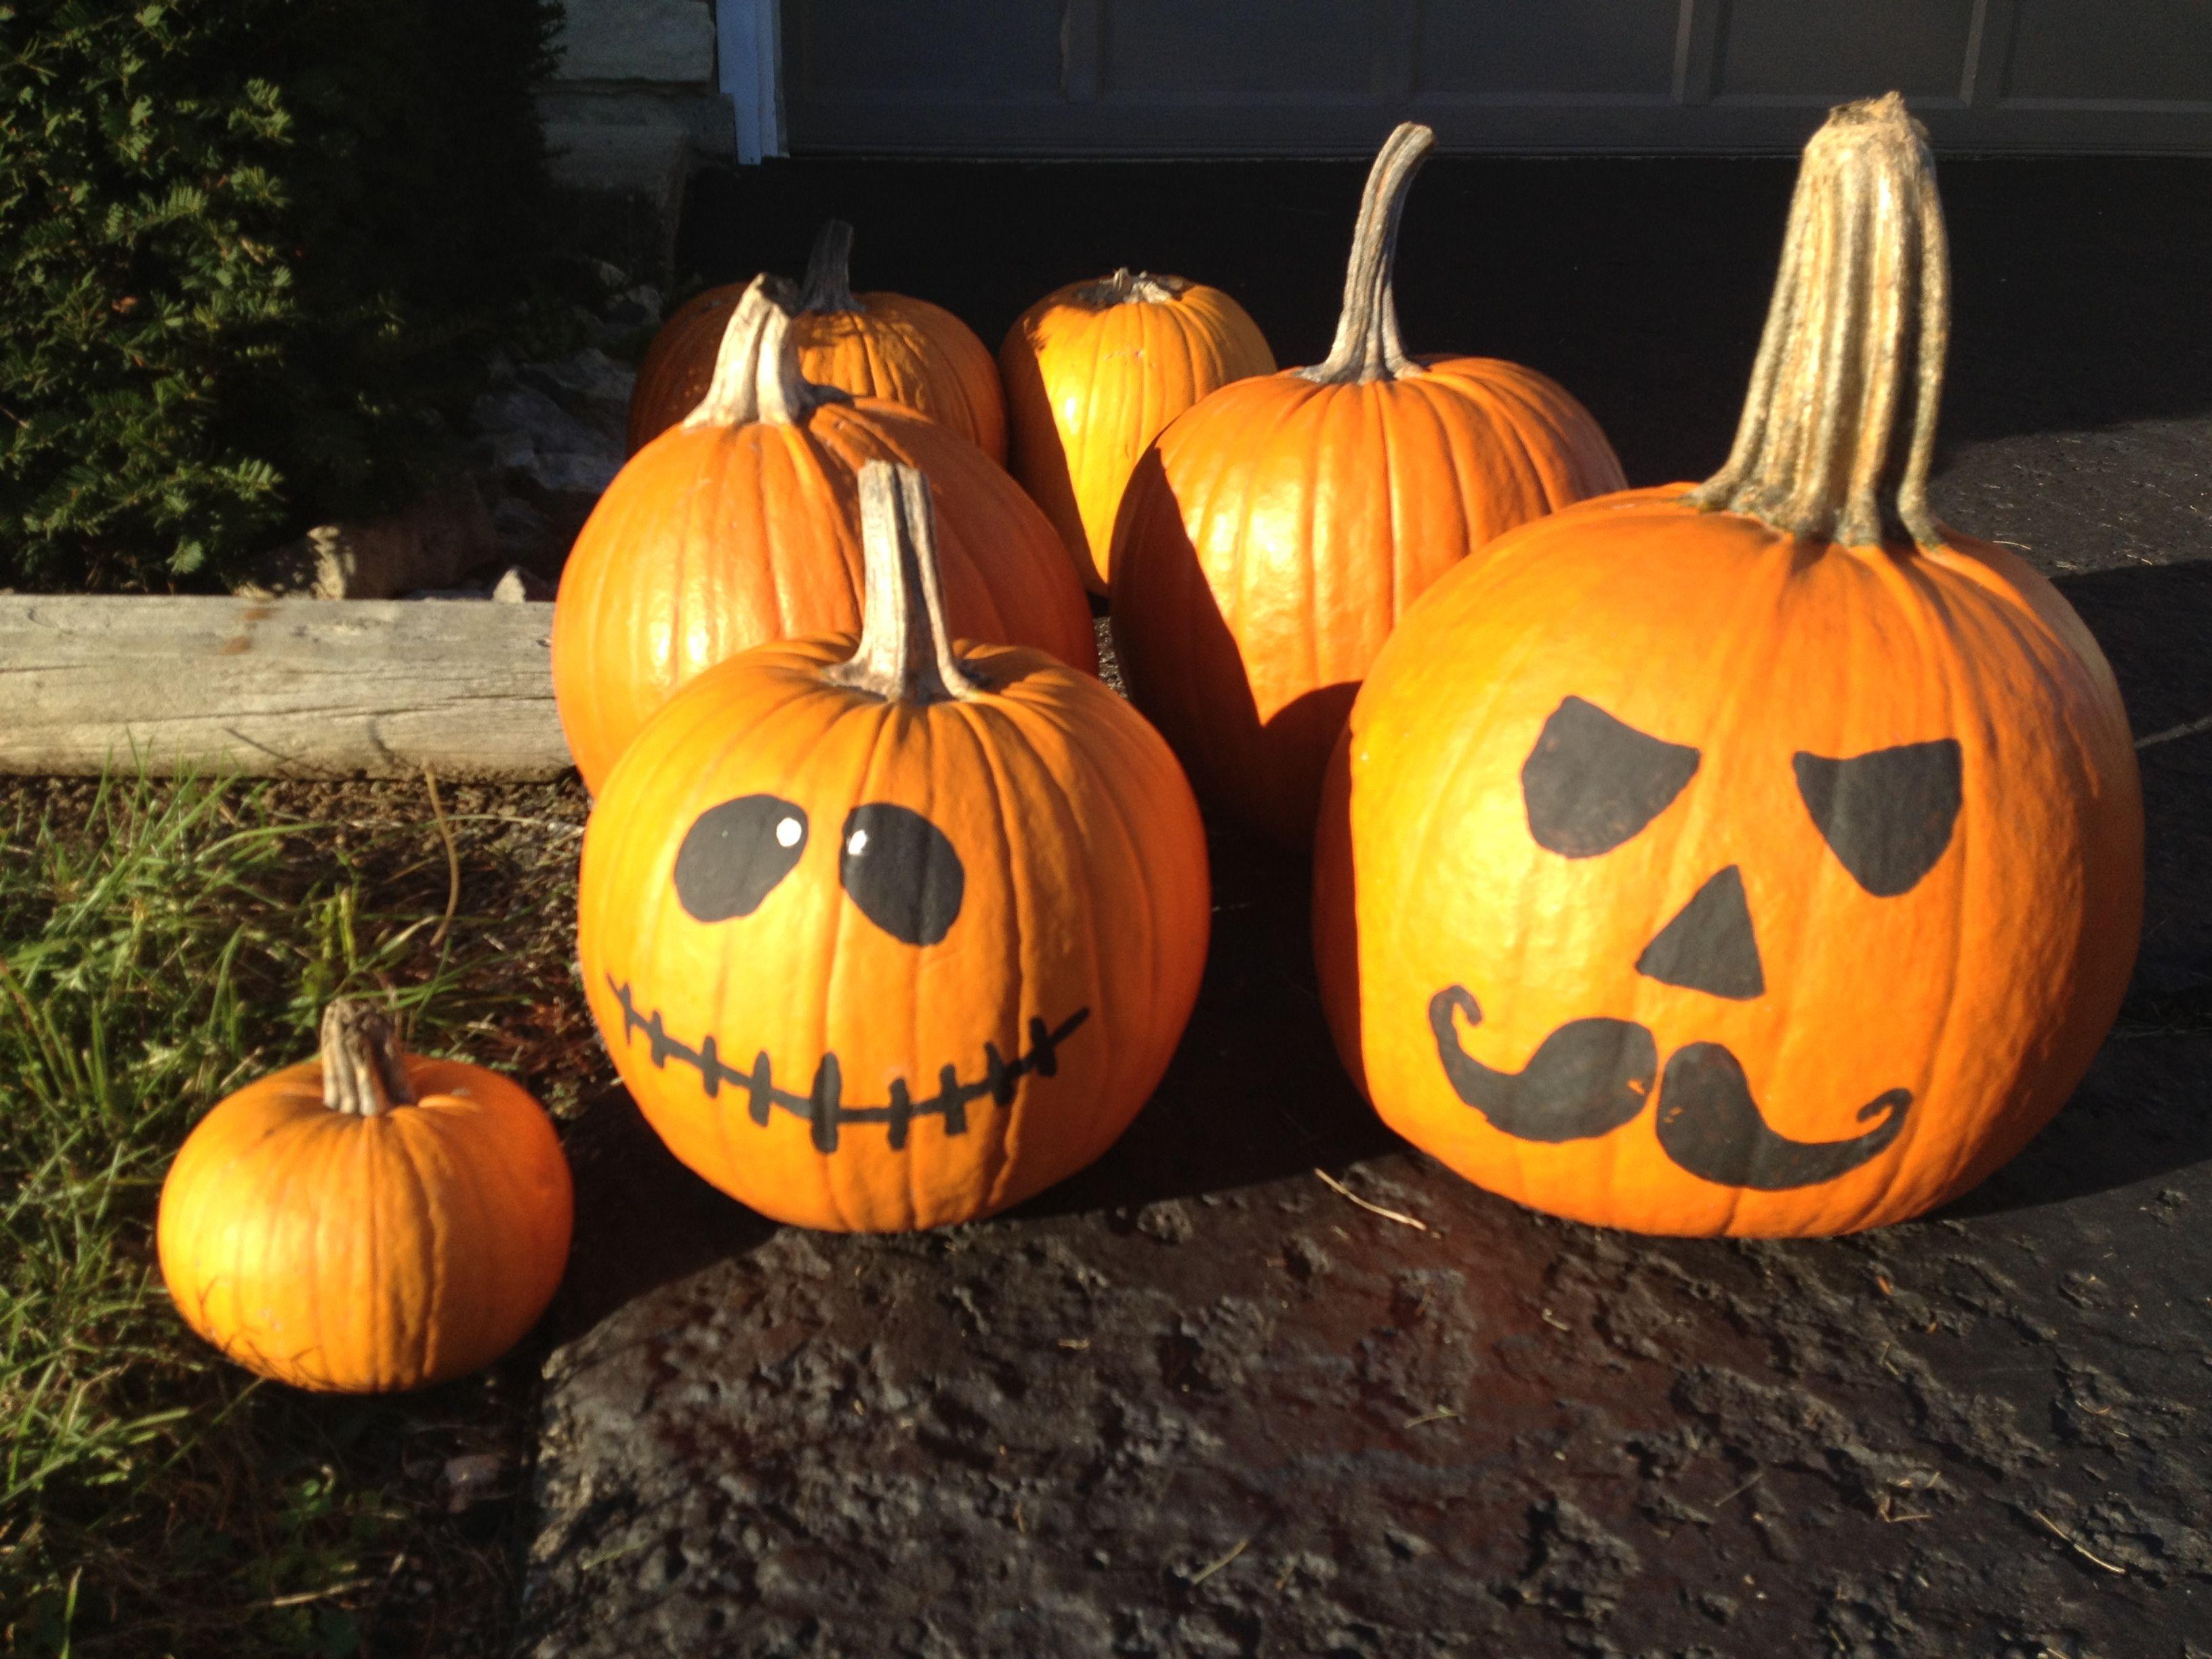 Pumpkin painting halloween ideas creative ideas for my for Halloween painting ideas